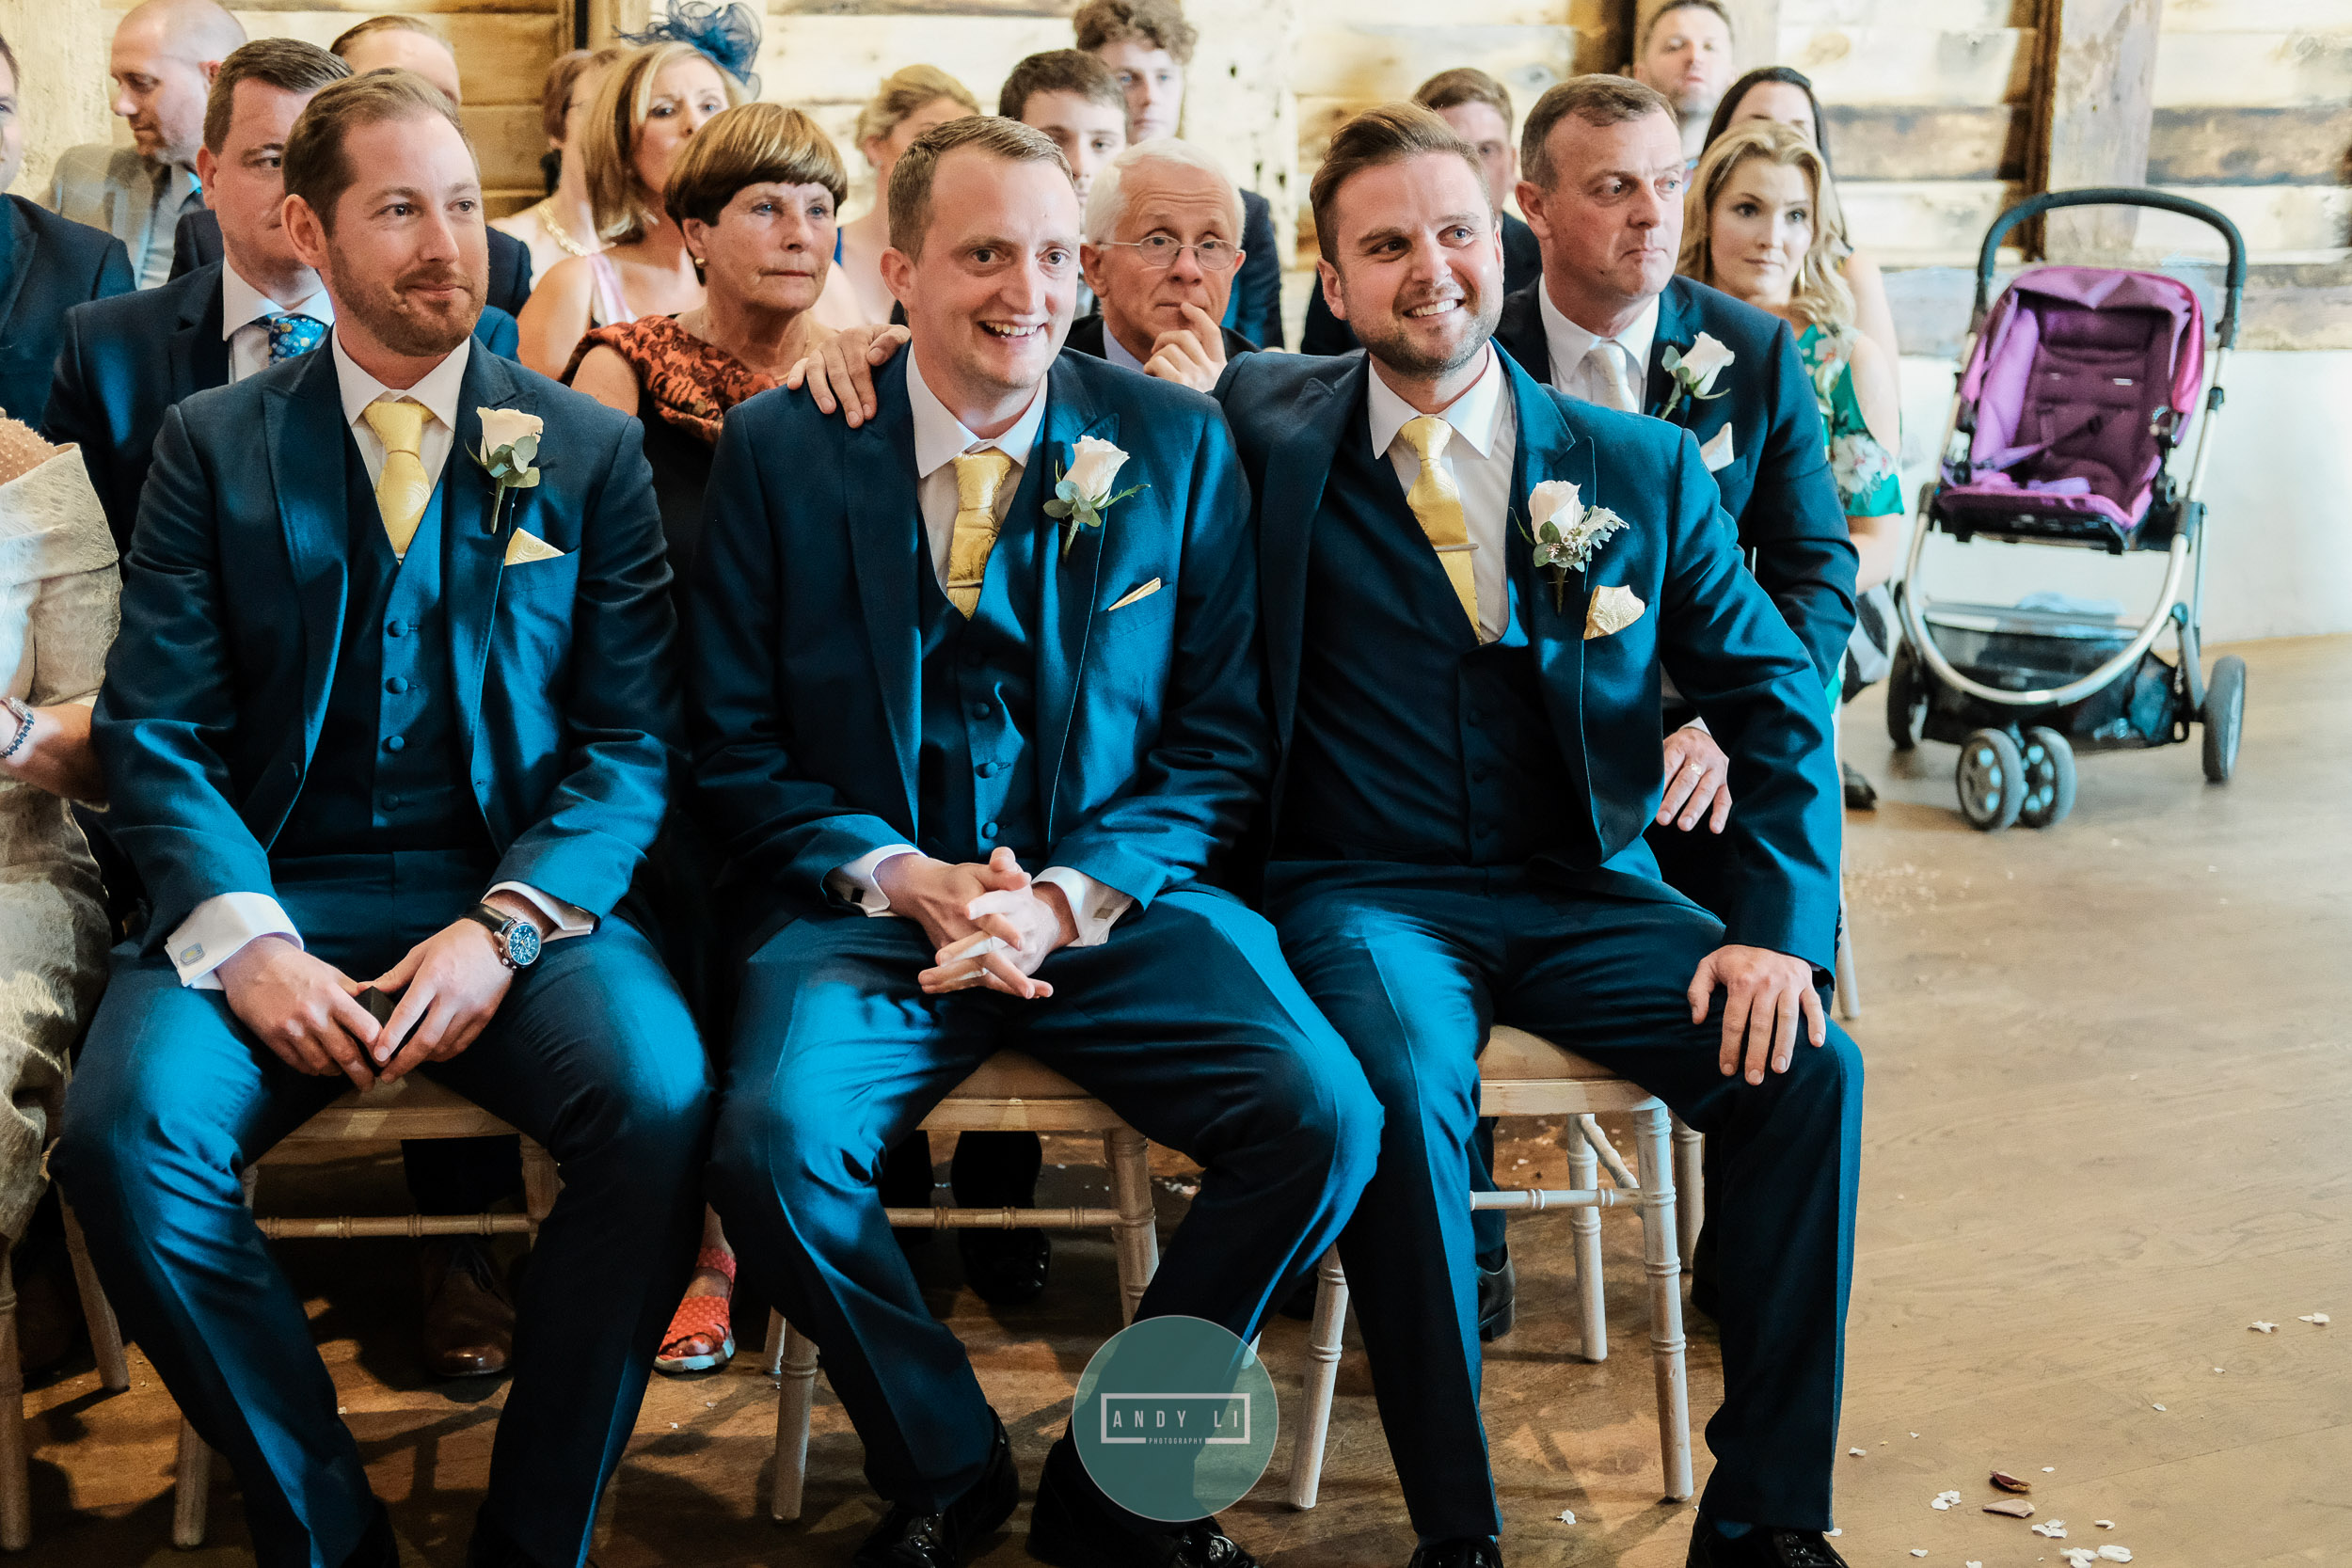 Pimhill Barn Wedding Photographer-052-DSCF0053.jpg